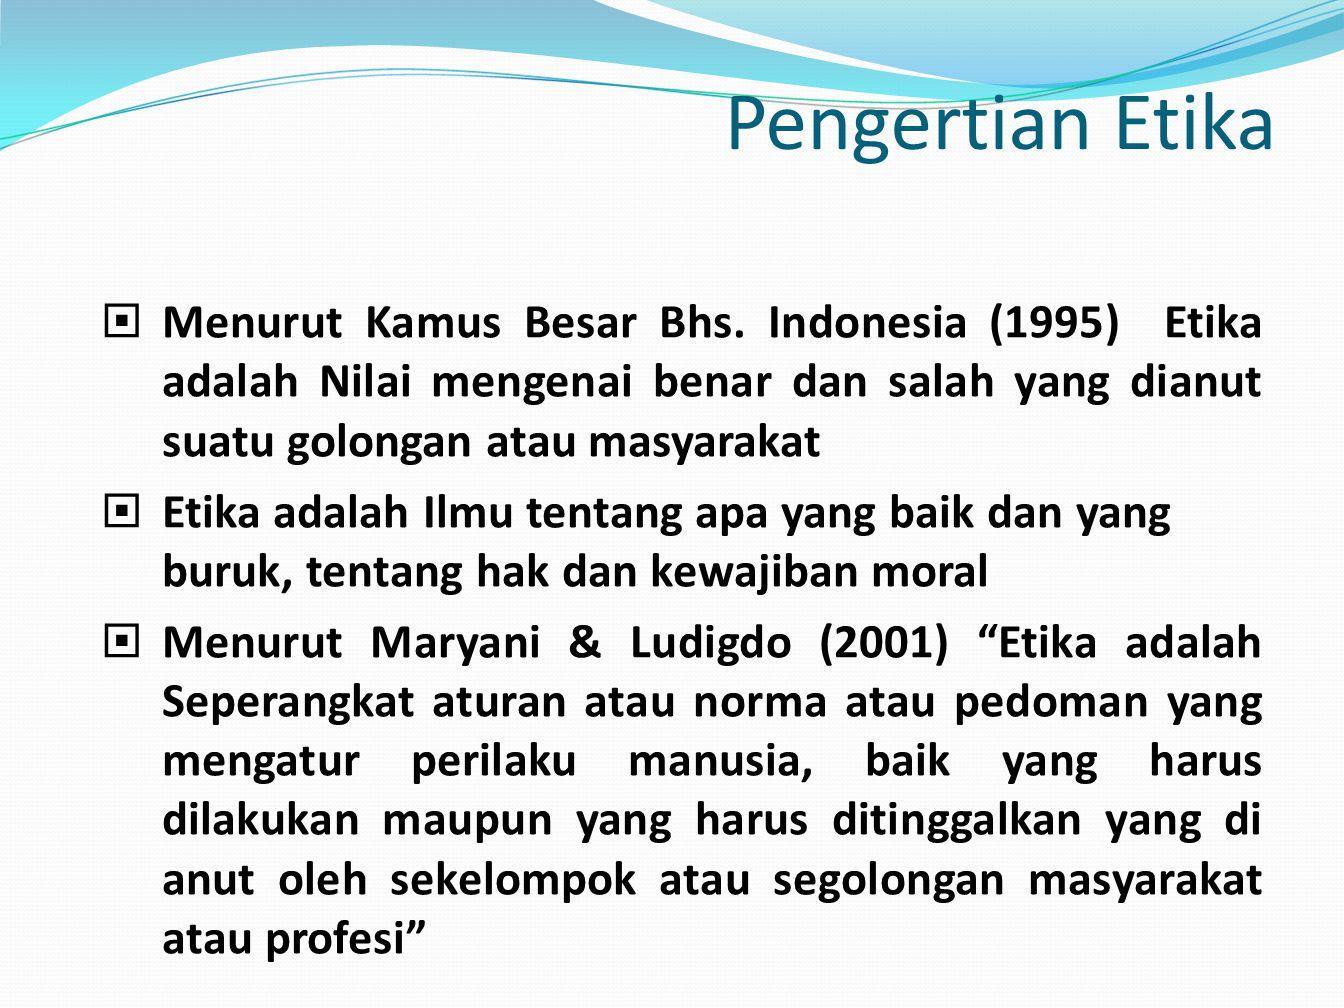 Pengertian Etika  Menurut Kamus Besar Bhs. Indonesia (1995) Etika adalah Nilai mengenai benar dan salah yang dianut suatu golongan atau masyarakat 